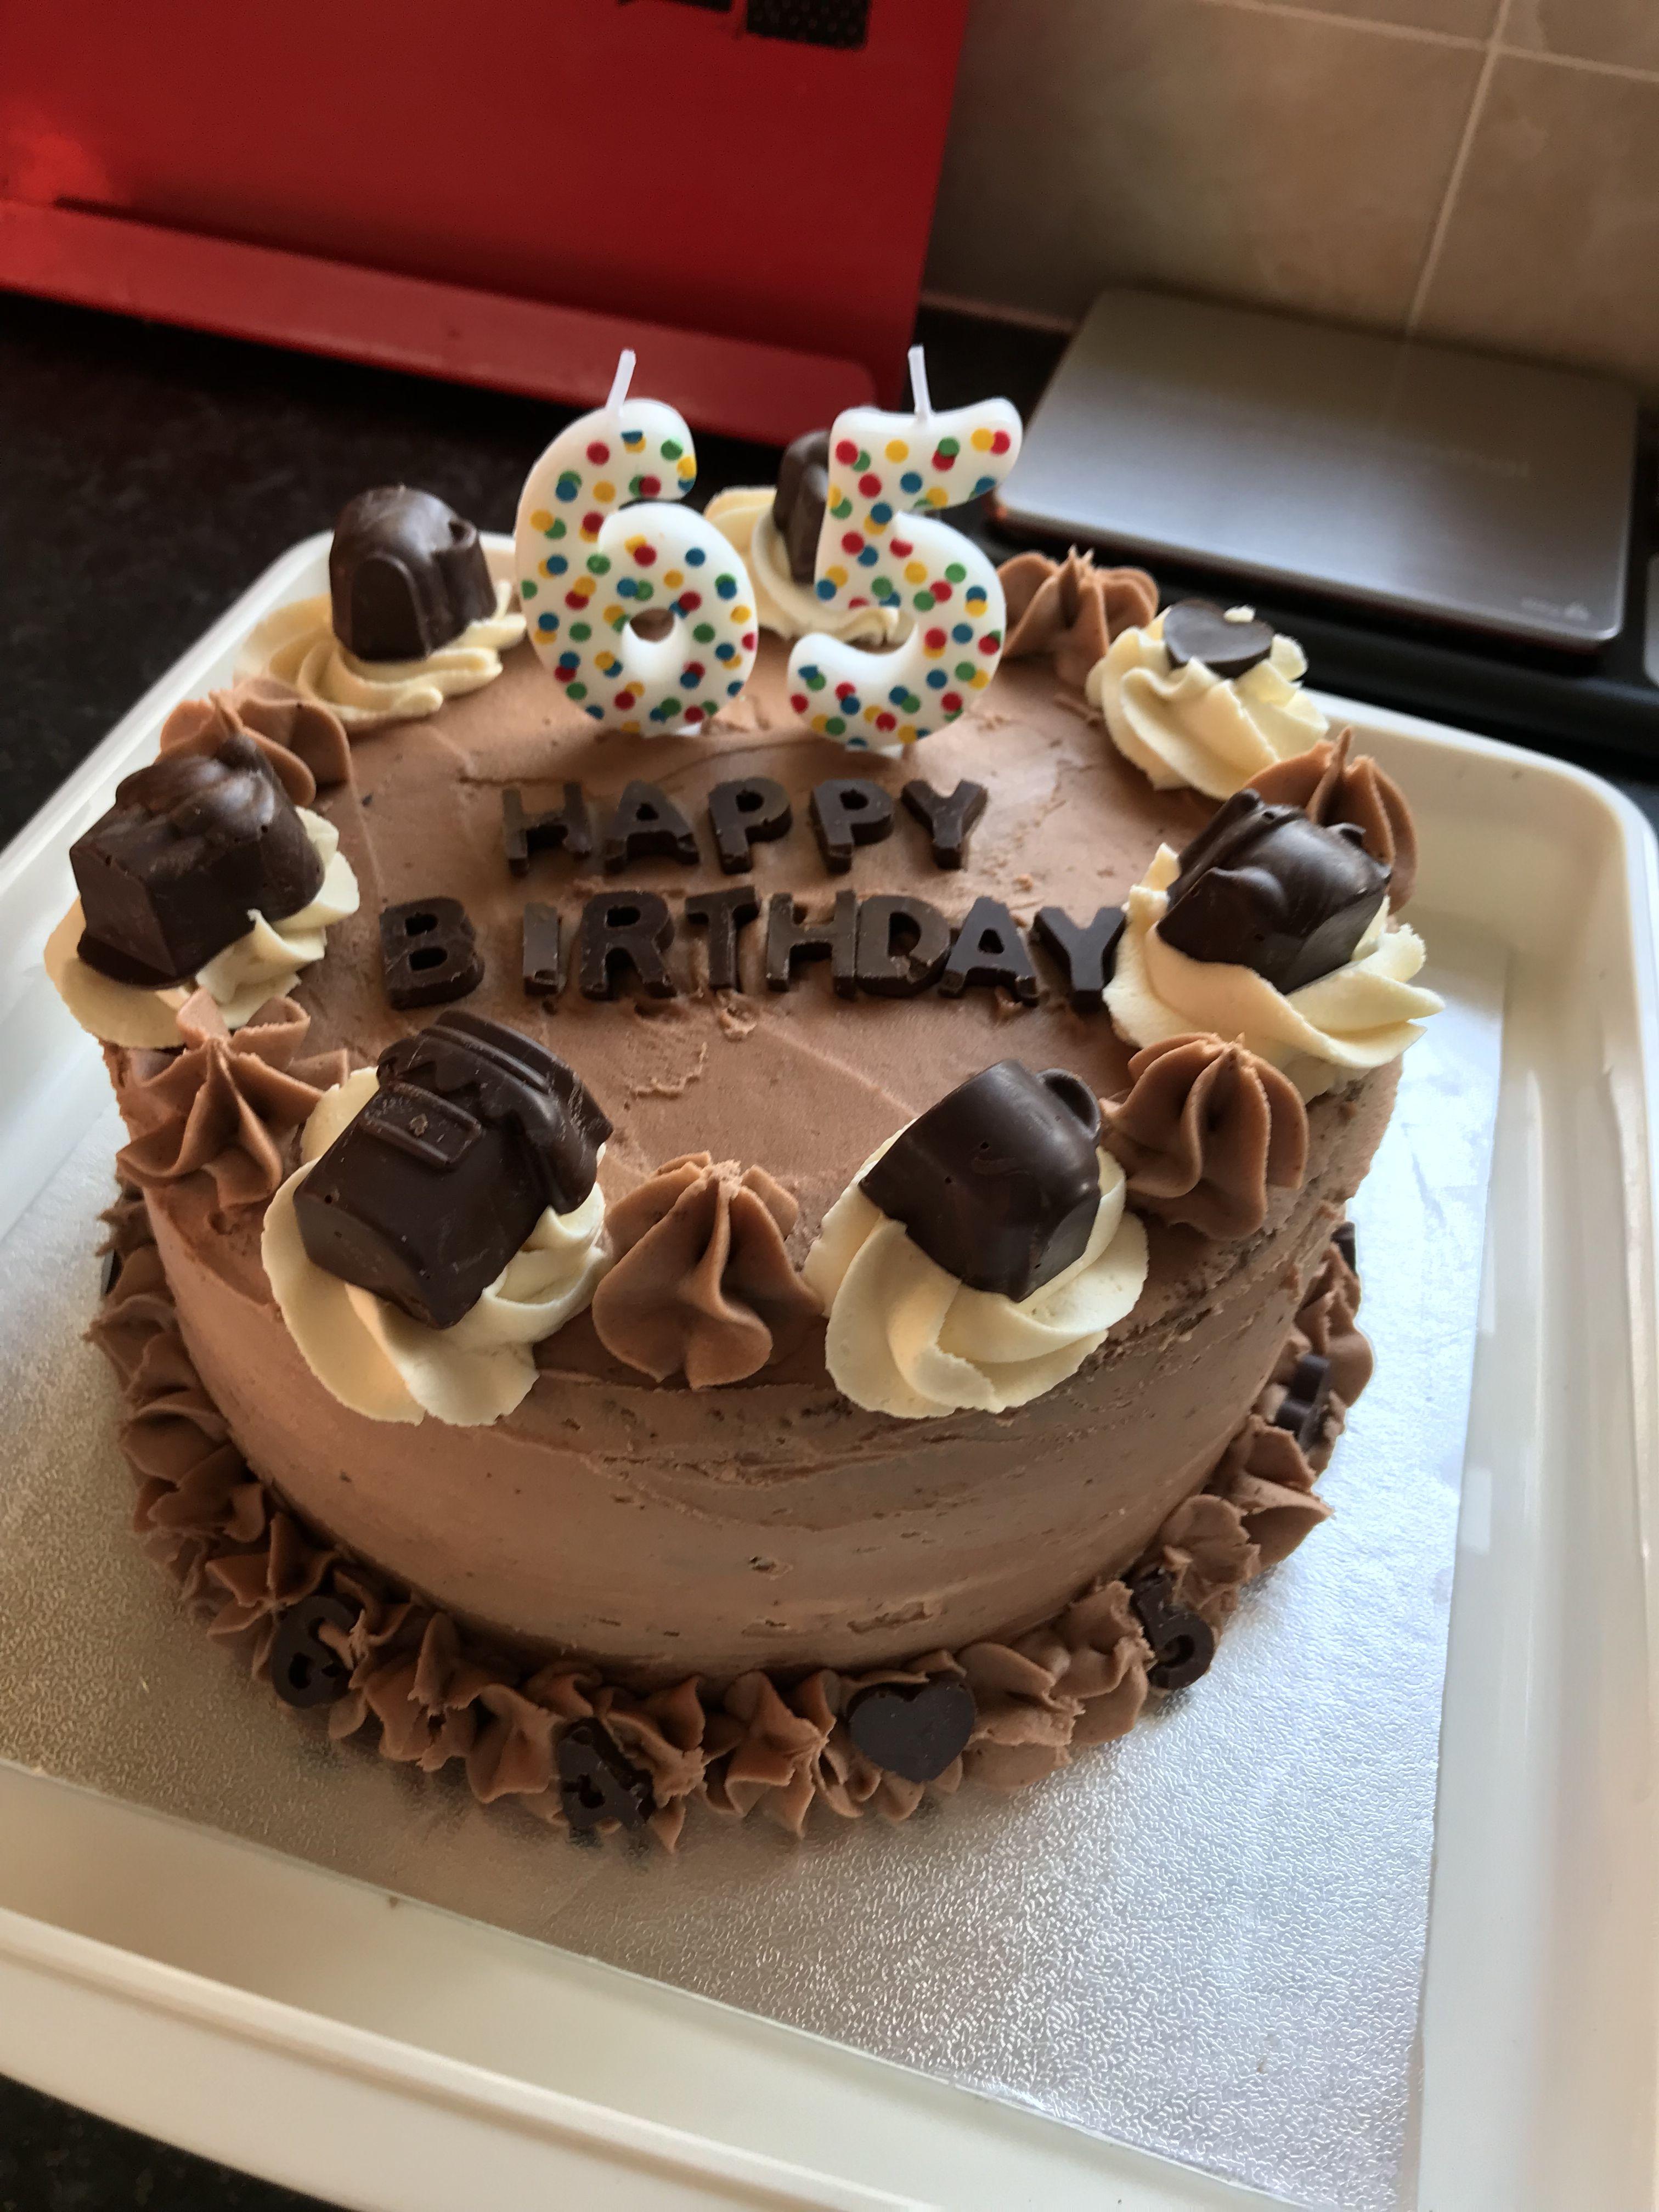 Chocolate Birthday Cake 7th Birthday Cakes New Cake Design